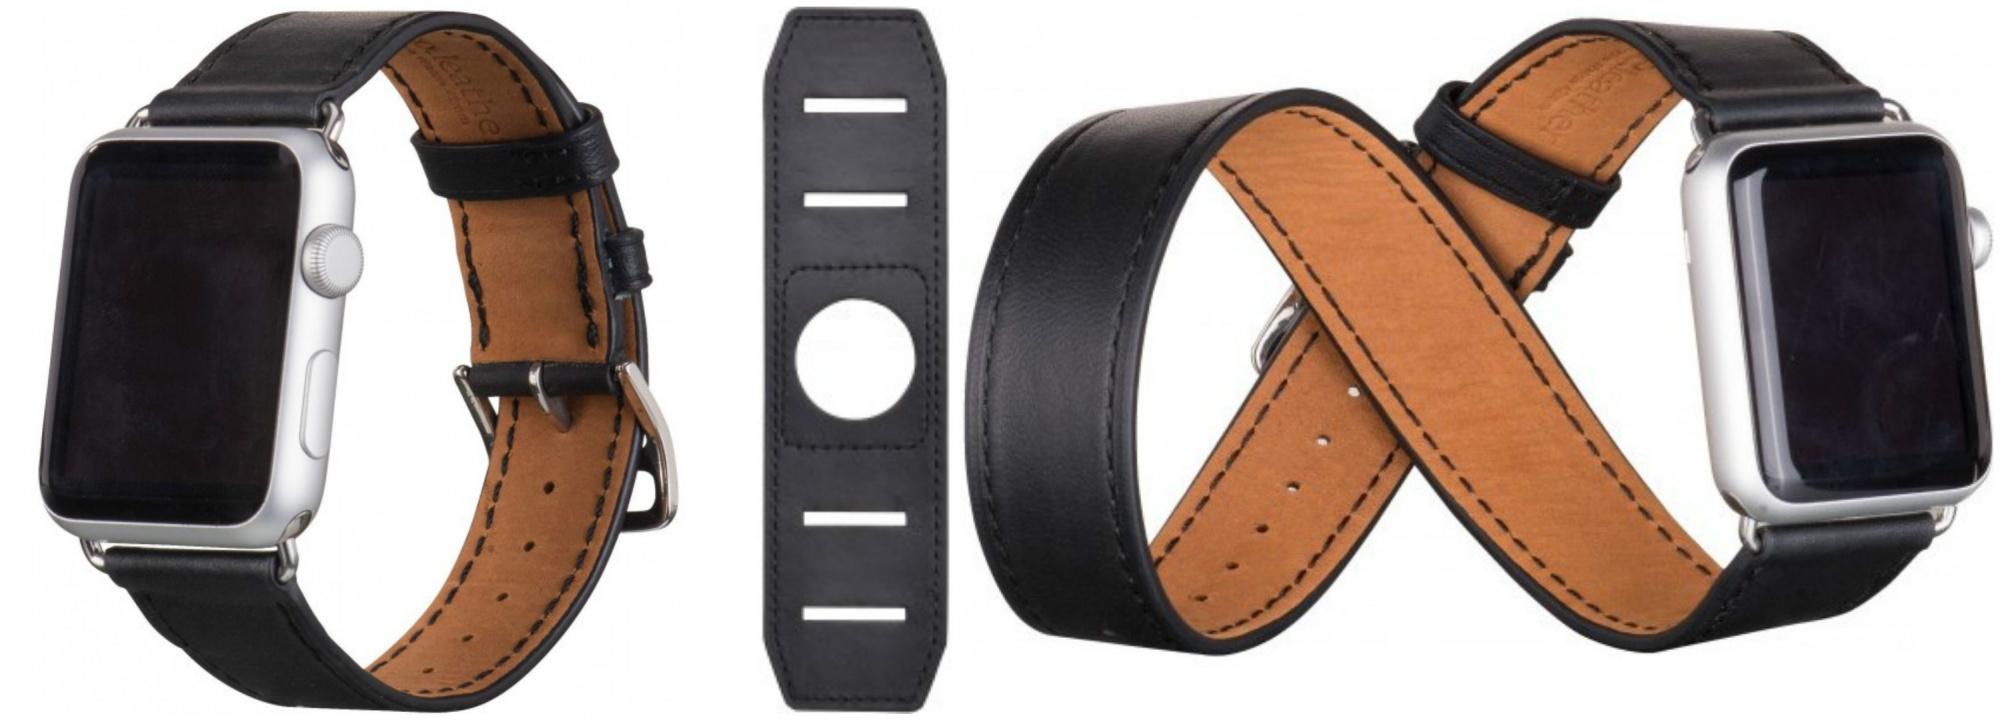 PlatinumАксессуары к Apple Watch<br>Ремешок для Apple Watch 38 mm<br>